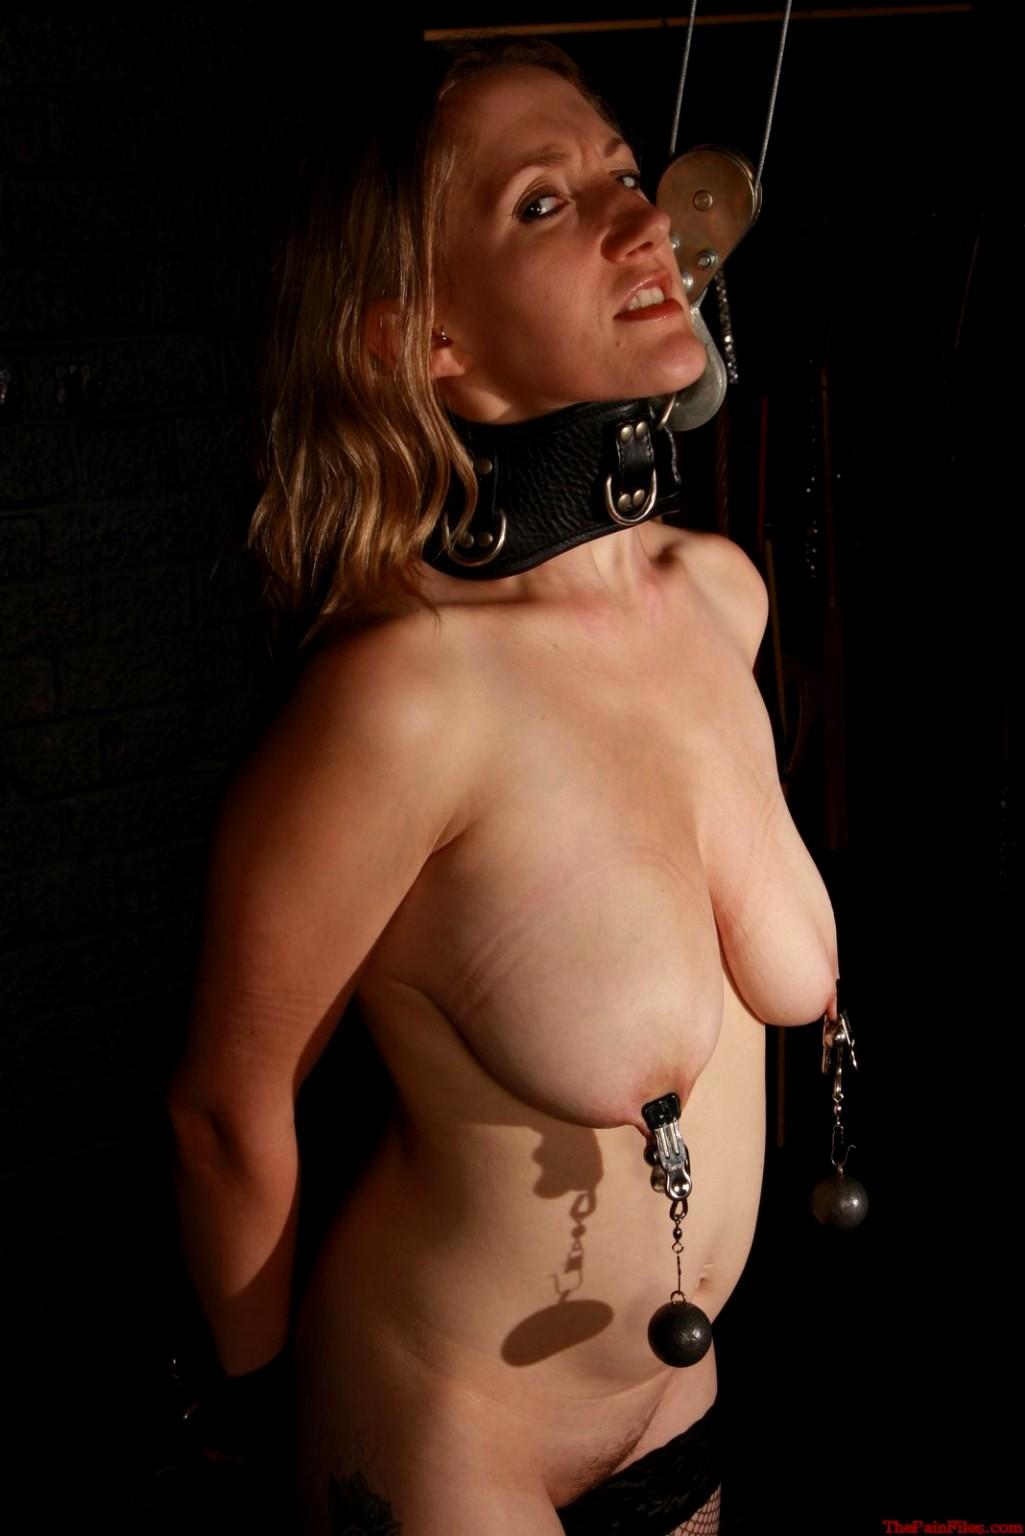 Breast binders leatherette bondage set BDSM bondage gear